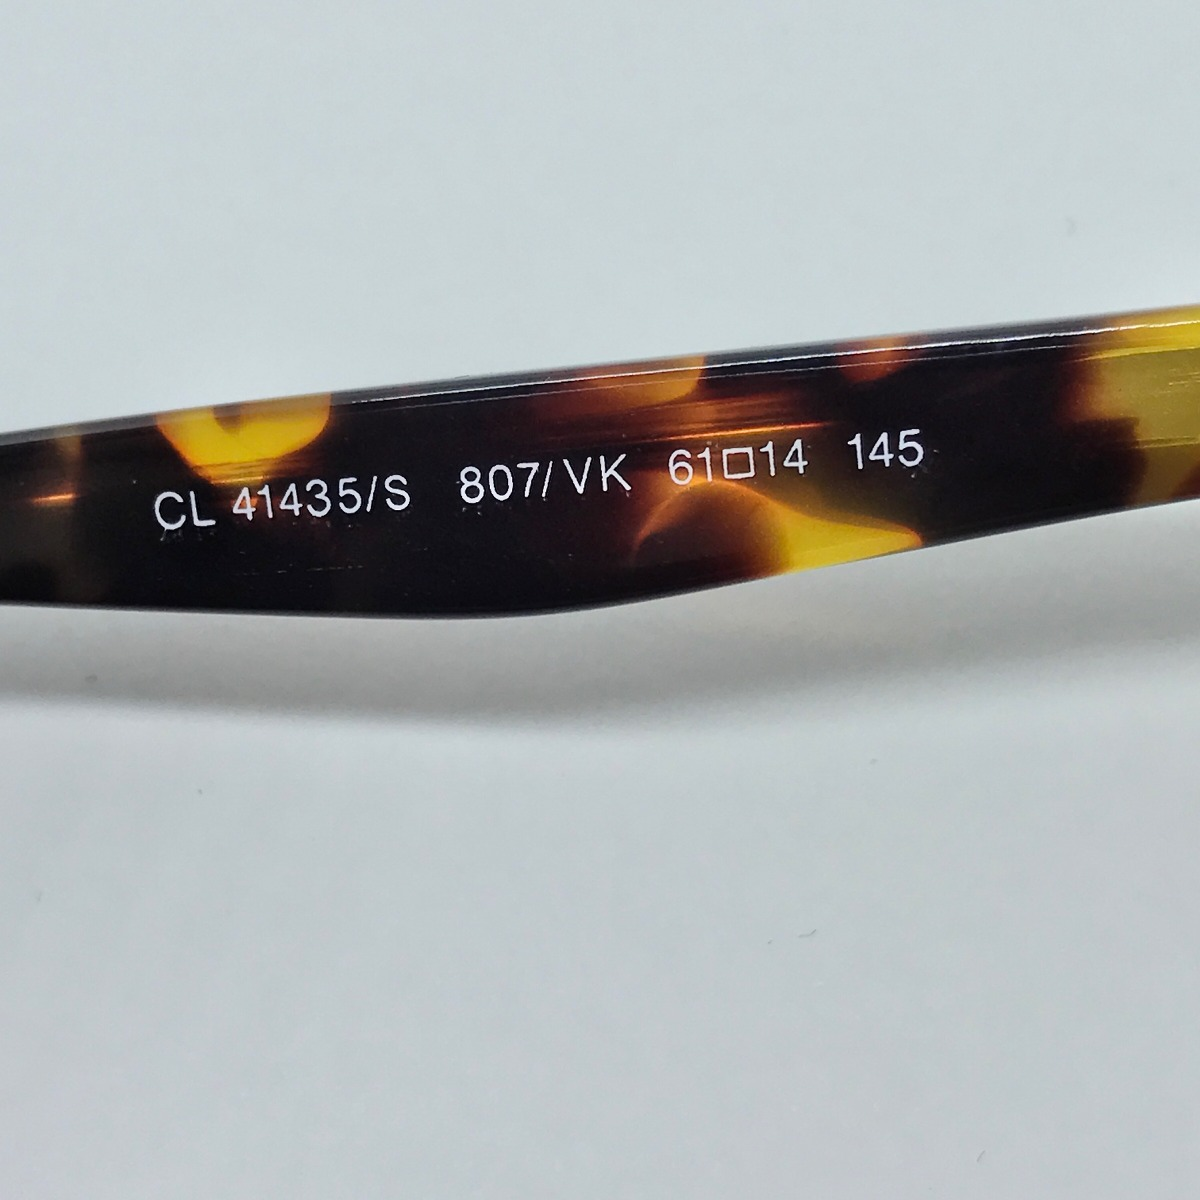 bb7b548940b9b Óculos Céline Thin Shadow Cl41435 Tartaruga - R  550,00 em Mercado Livre